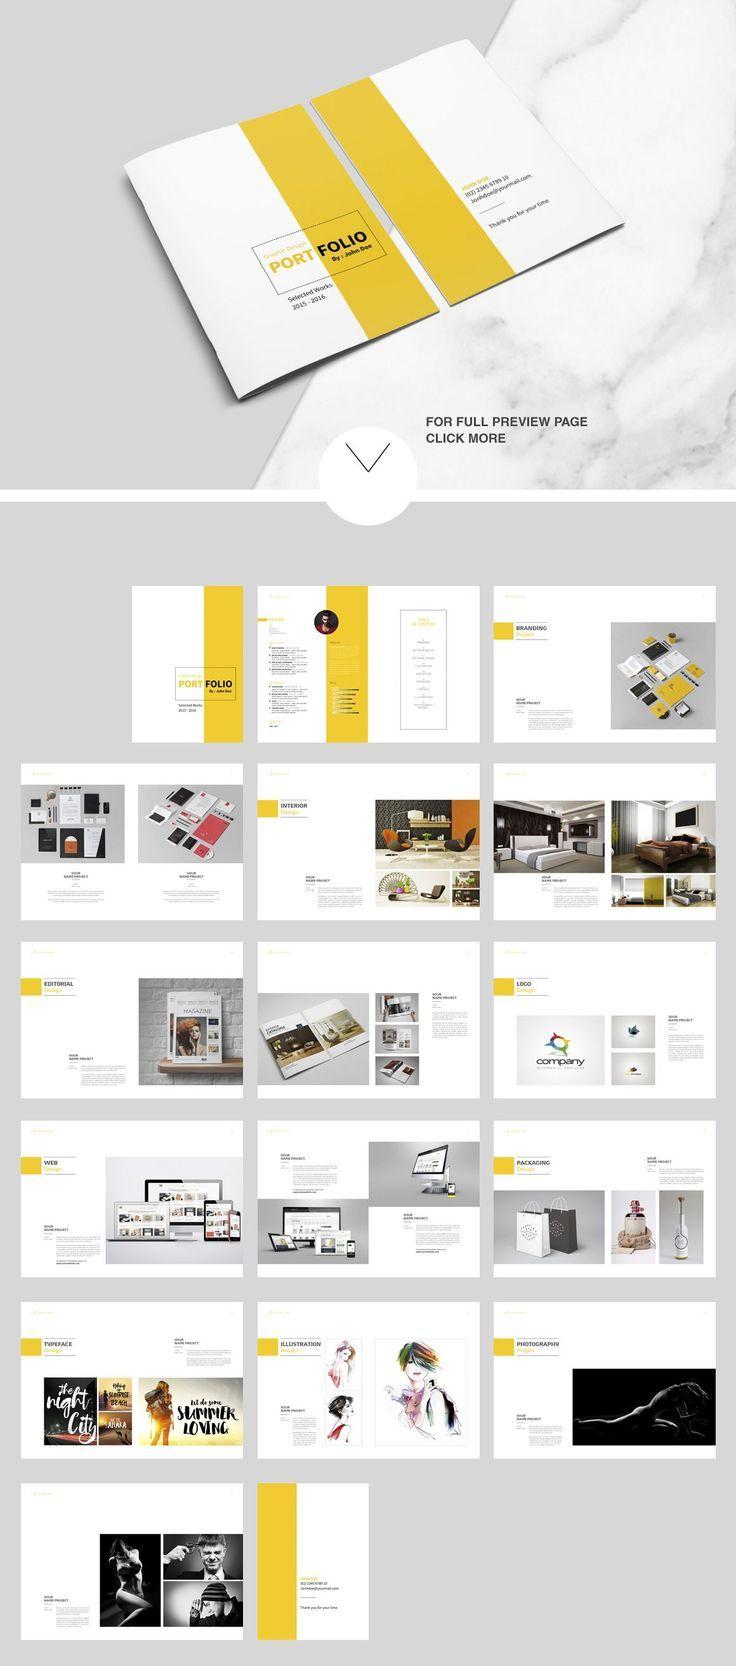 Indesign Portfolio Brochure - Vol. 2 by tujuhbenua on Creative Market ⚙Visit ... -  # #onlineportfolio